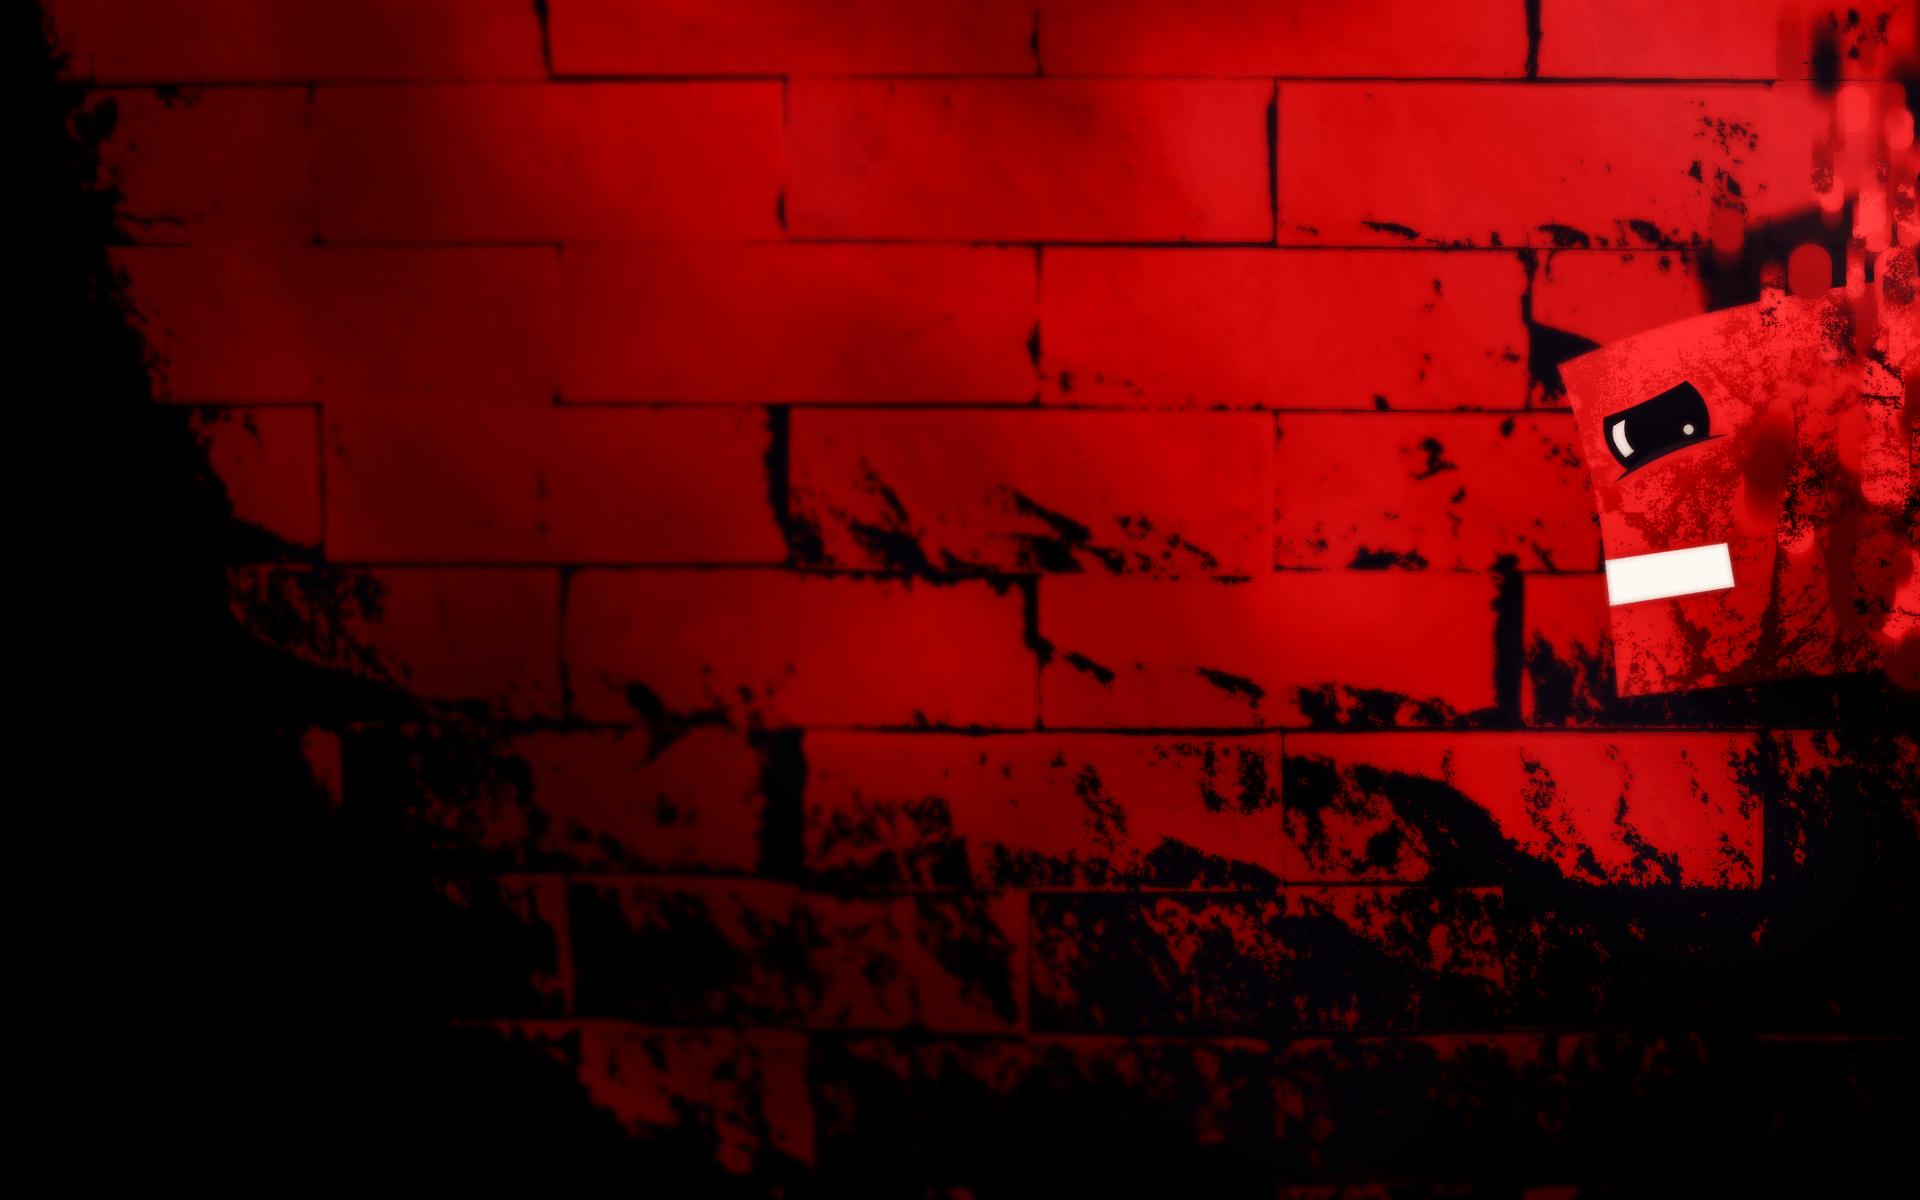 Super Meat Boy Wallpapers Wallpaper Cave